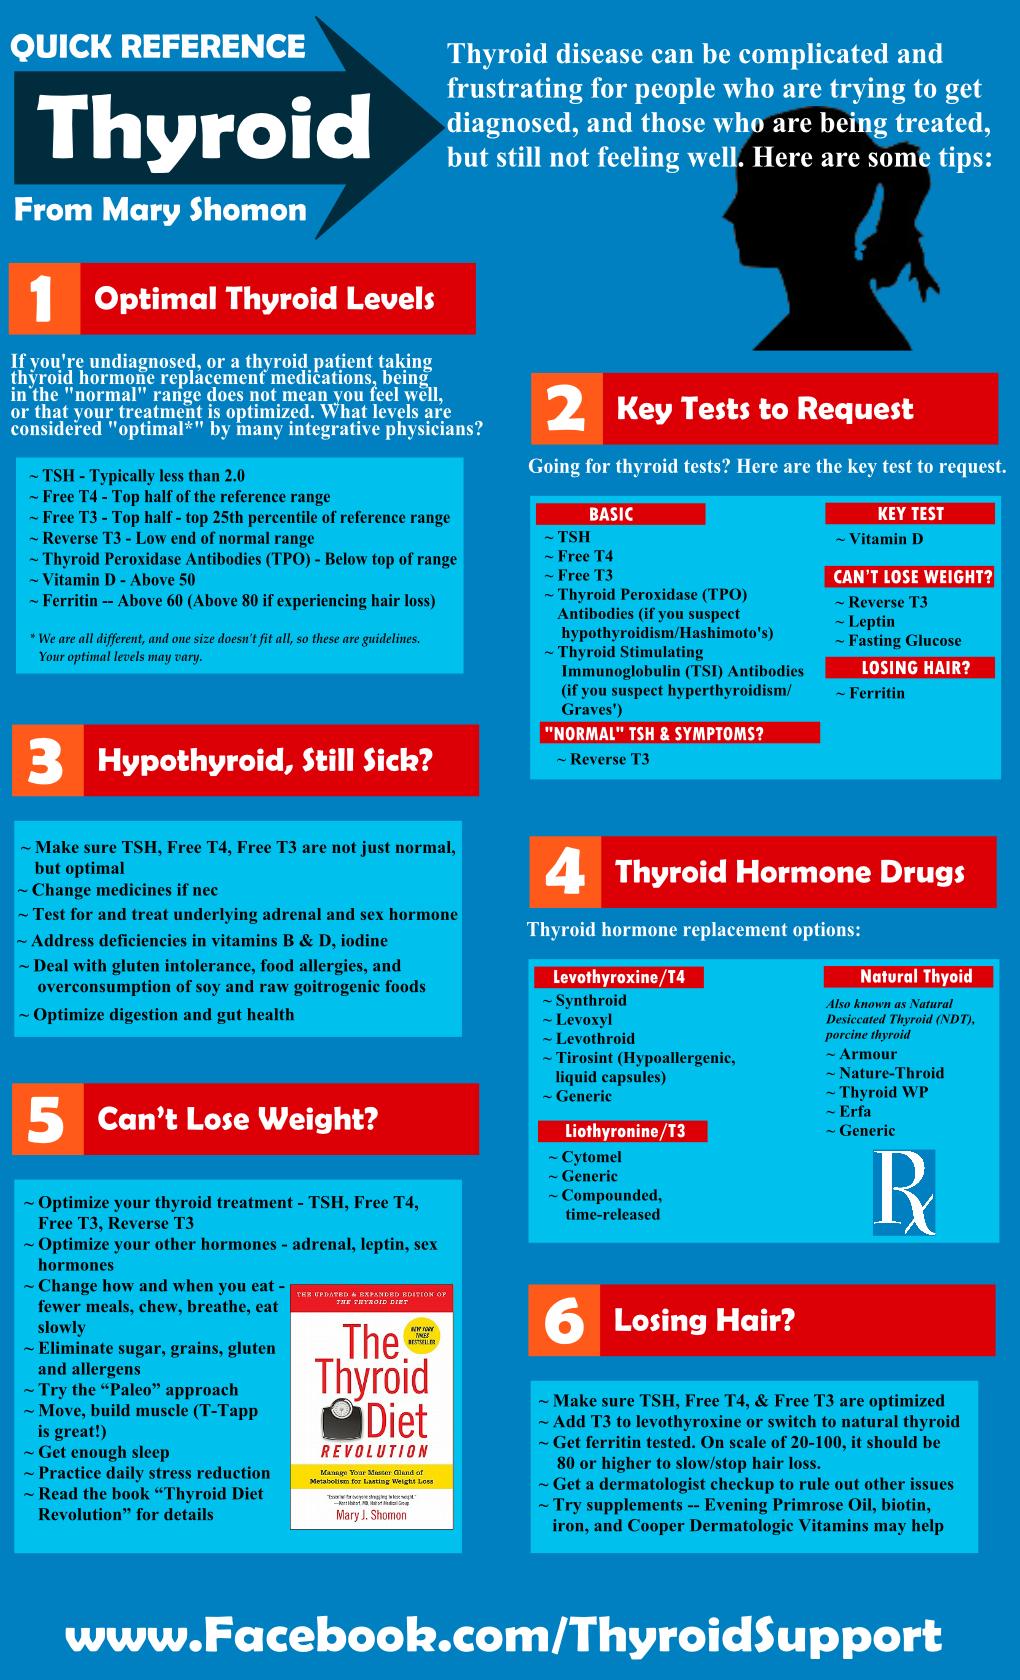 1200 calorie diet meal plan shopping list pdf image 7